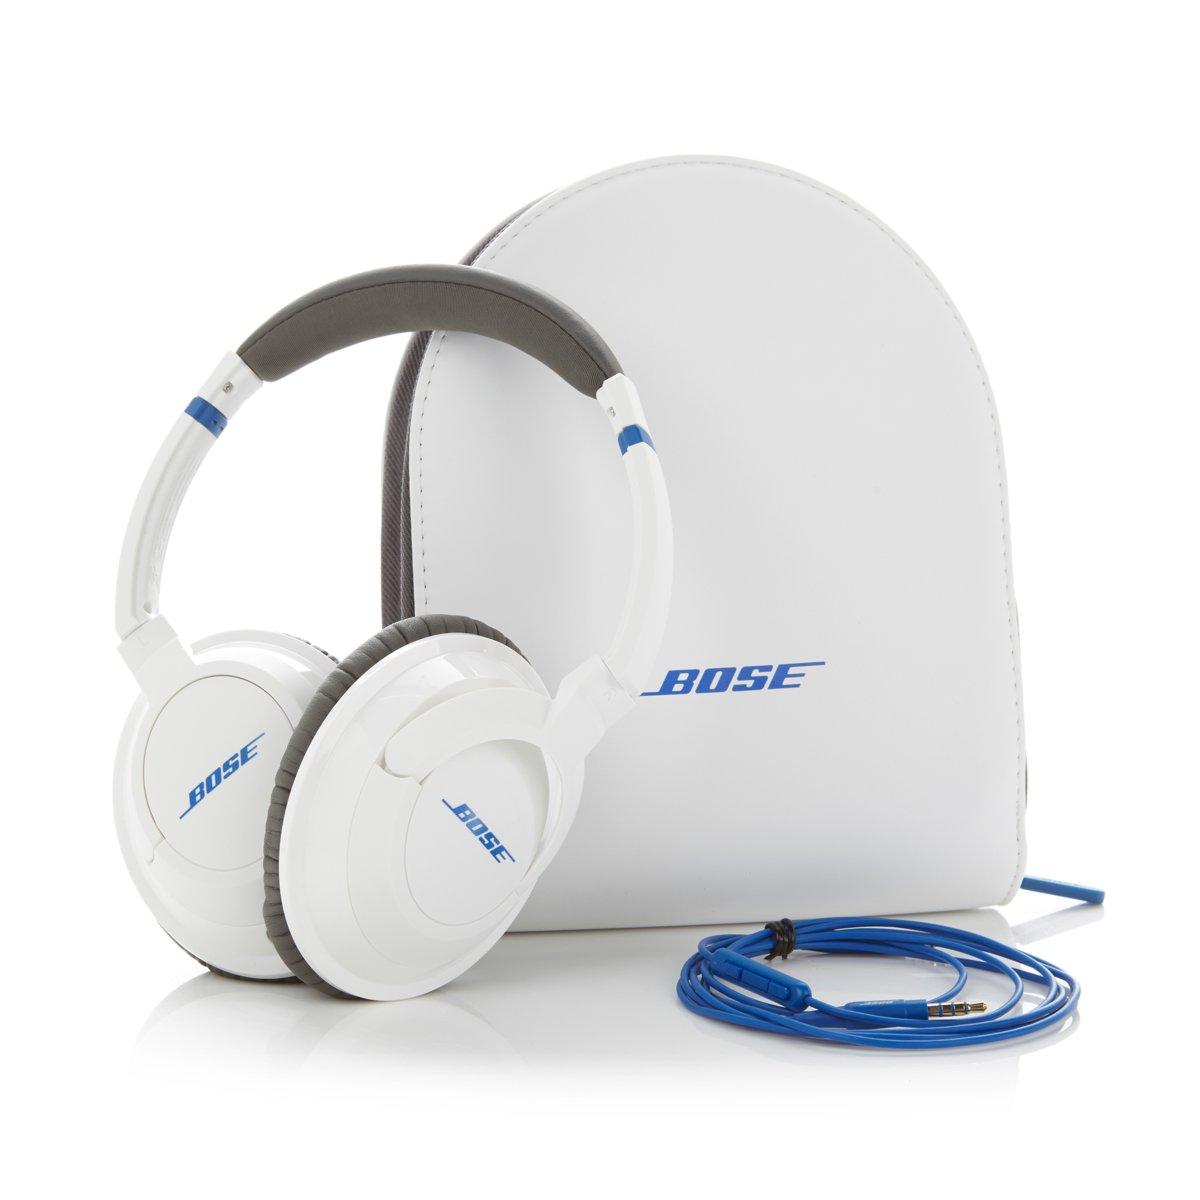 Bose® SoundTrue™ Around-Ear Headphones - $64.95 with Visa checkout - FS @ hsn.com